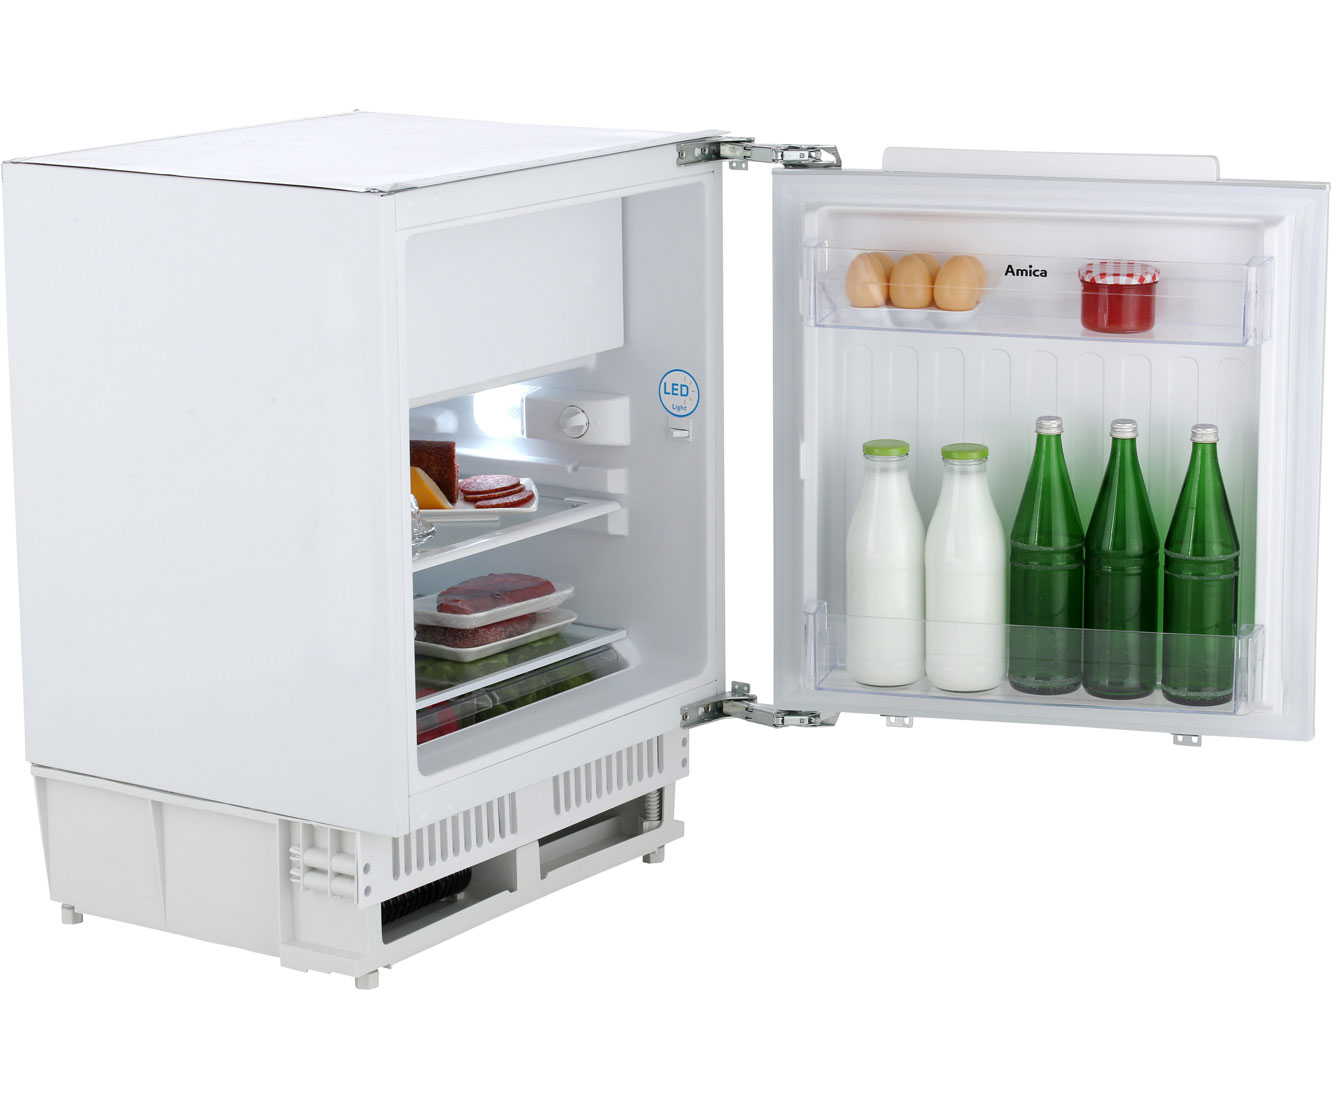 Amica Uks16158 Kühlschrank : Amica kühlschrank uks a amica uks unterbau kühlschrank mit